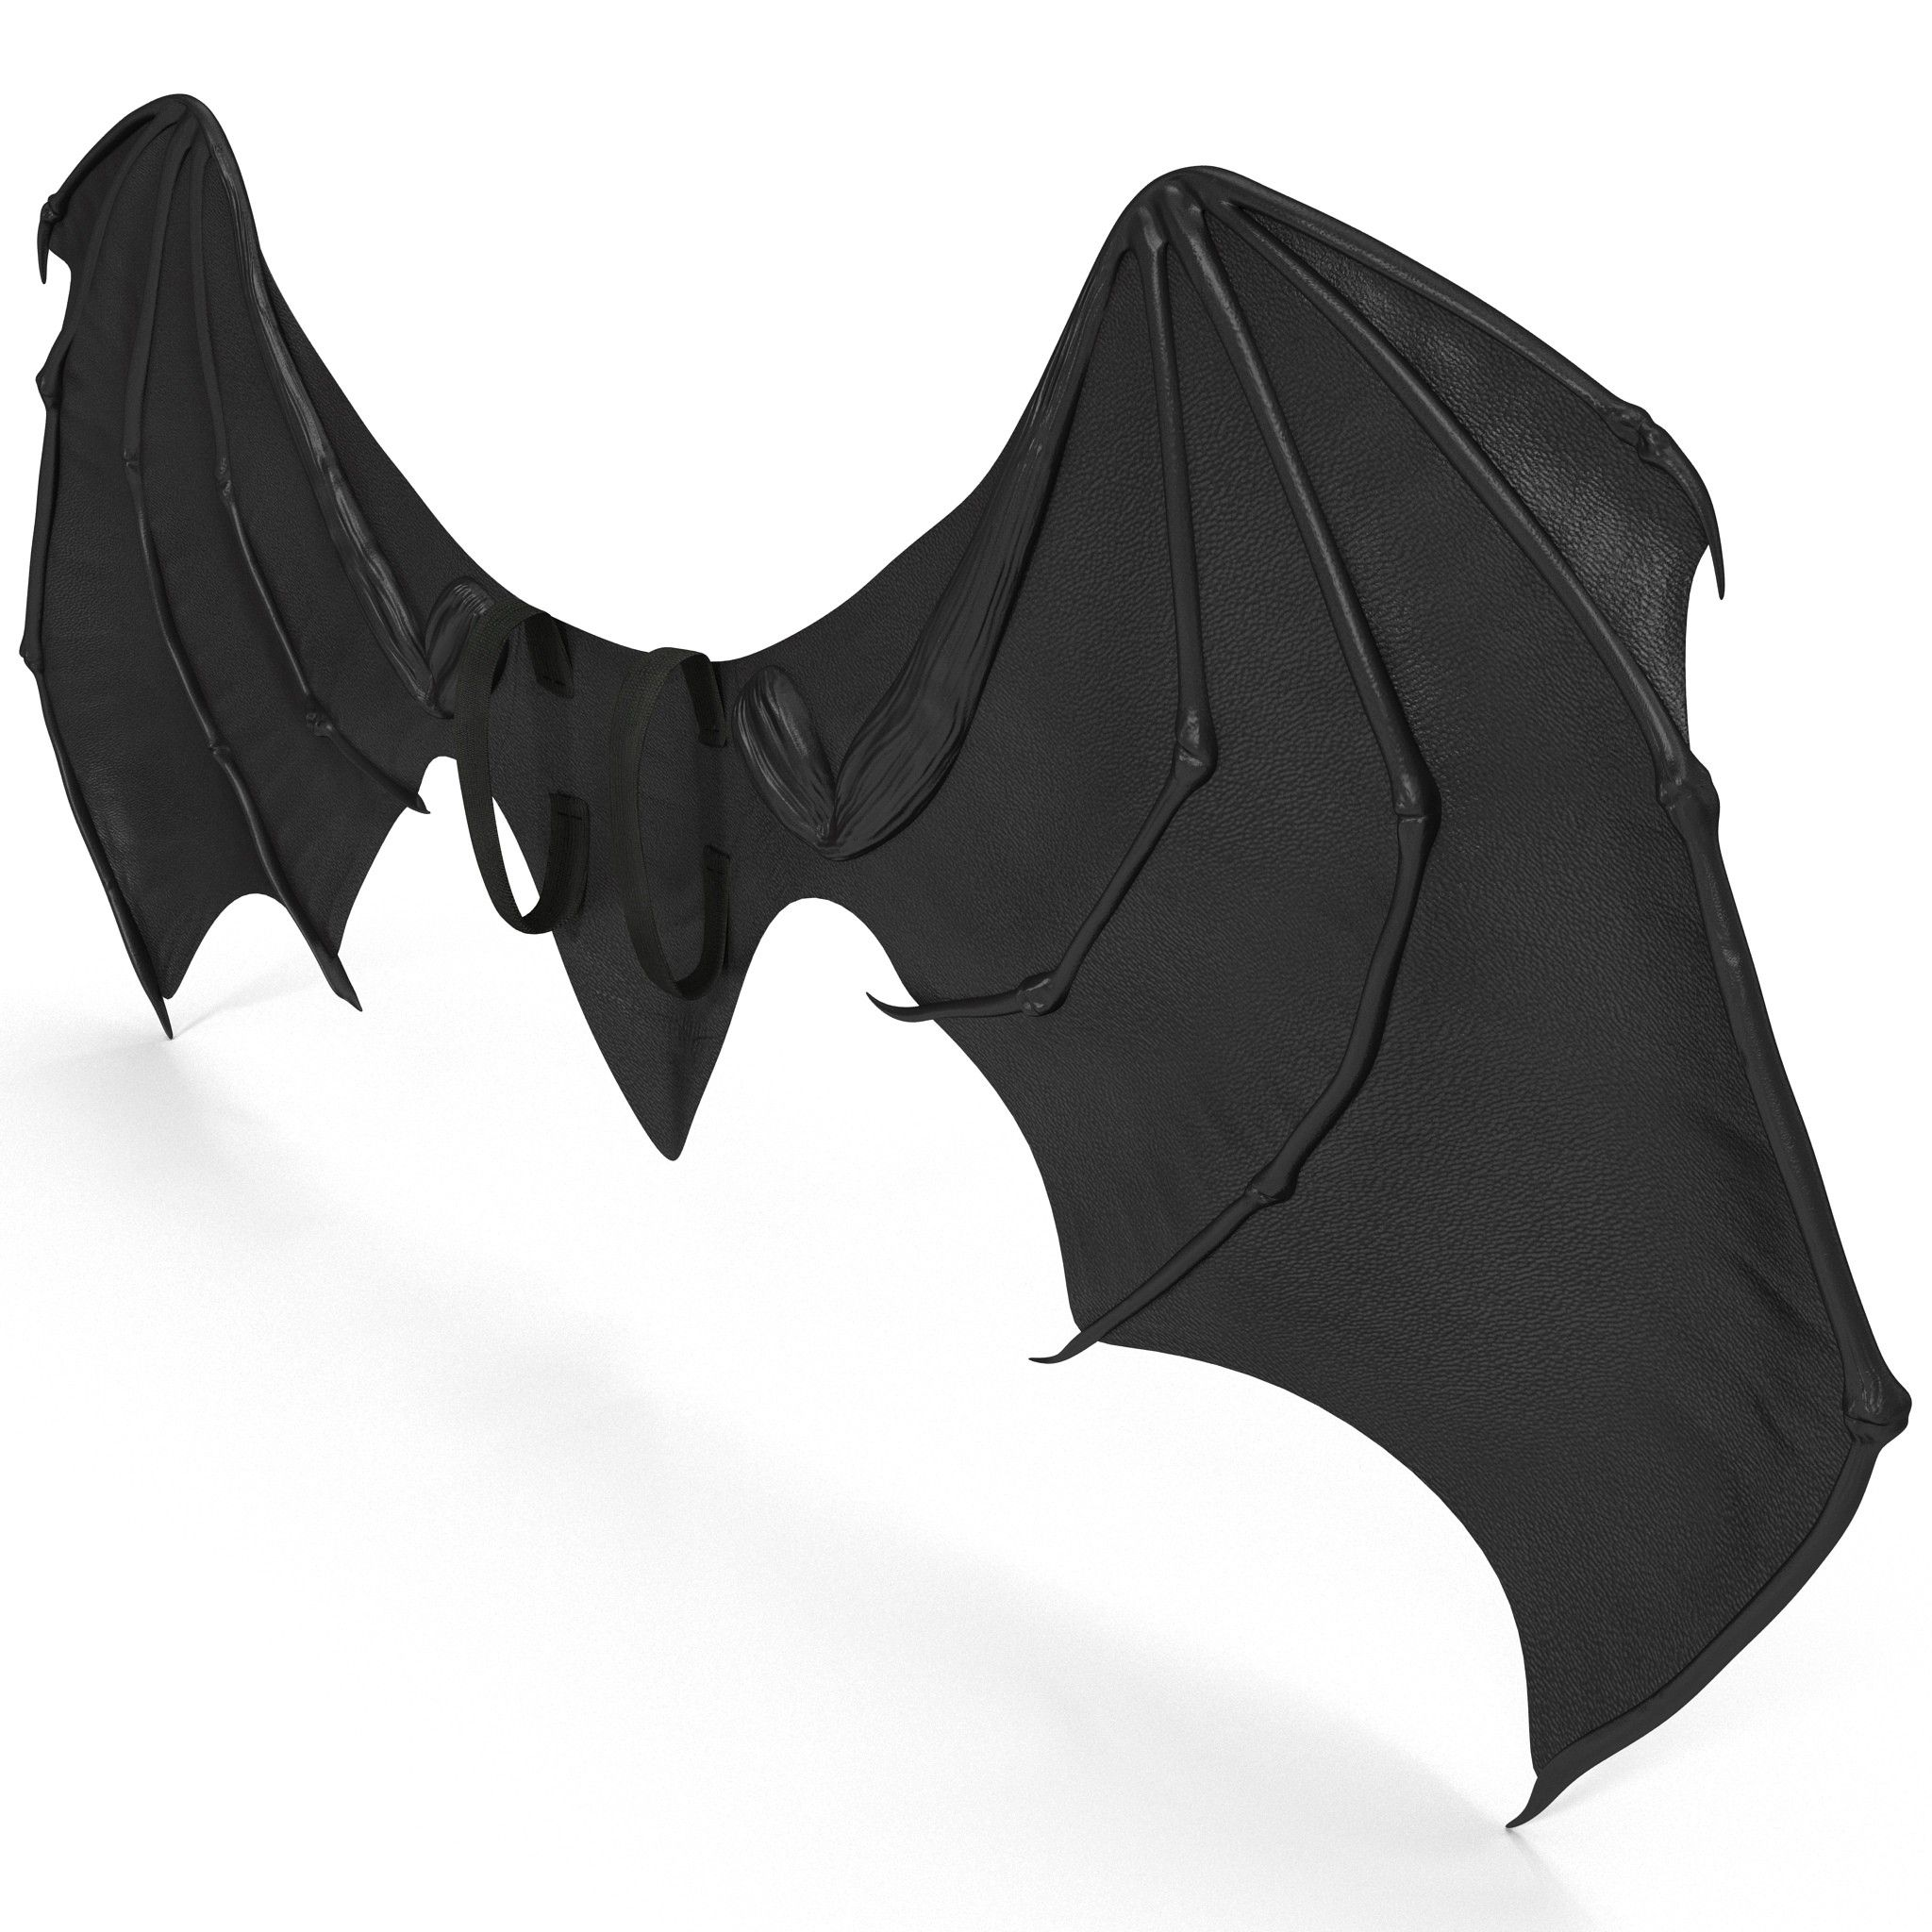 obj costume bat wings | Costumes | Bat wings, Bat costume